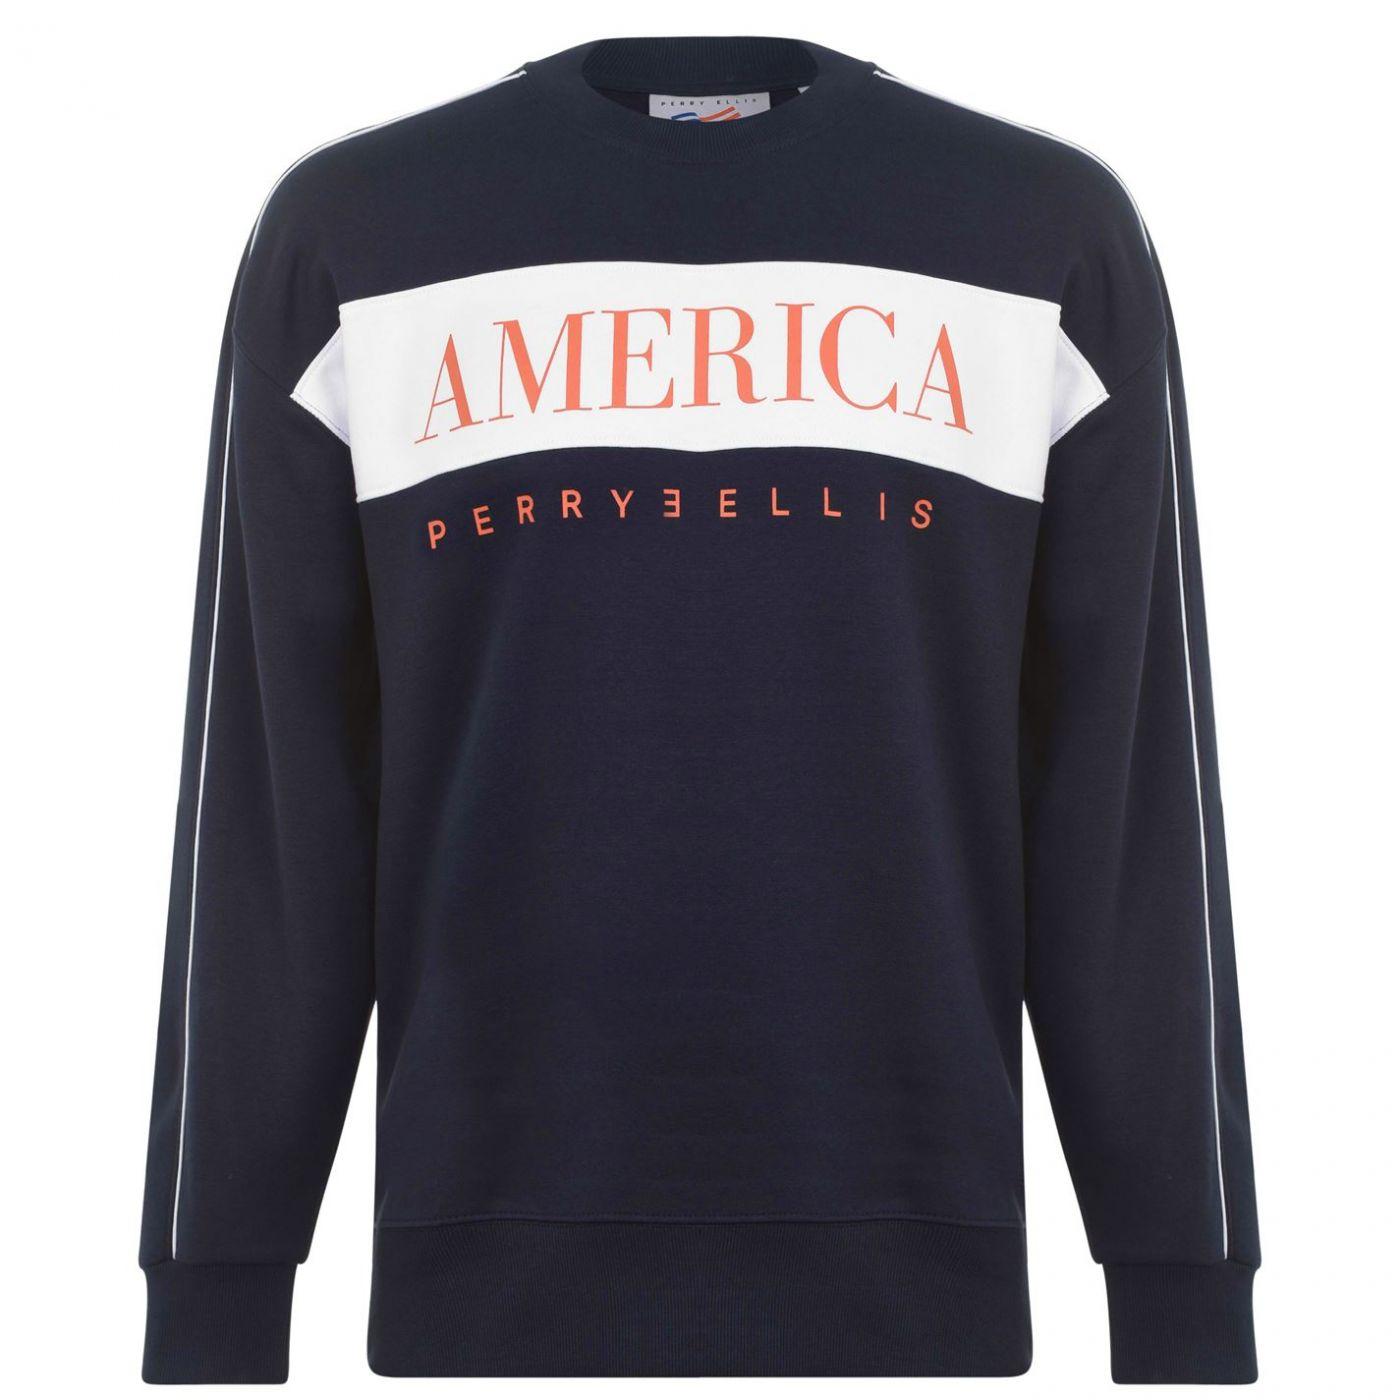 Perry Ellis America Sweater